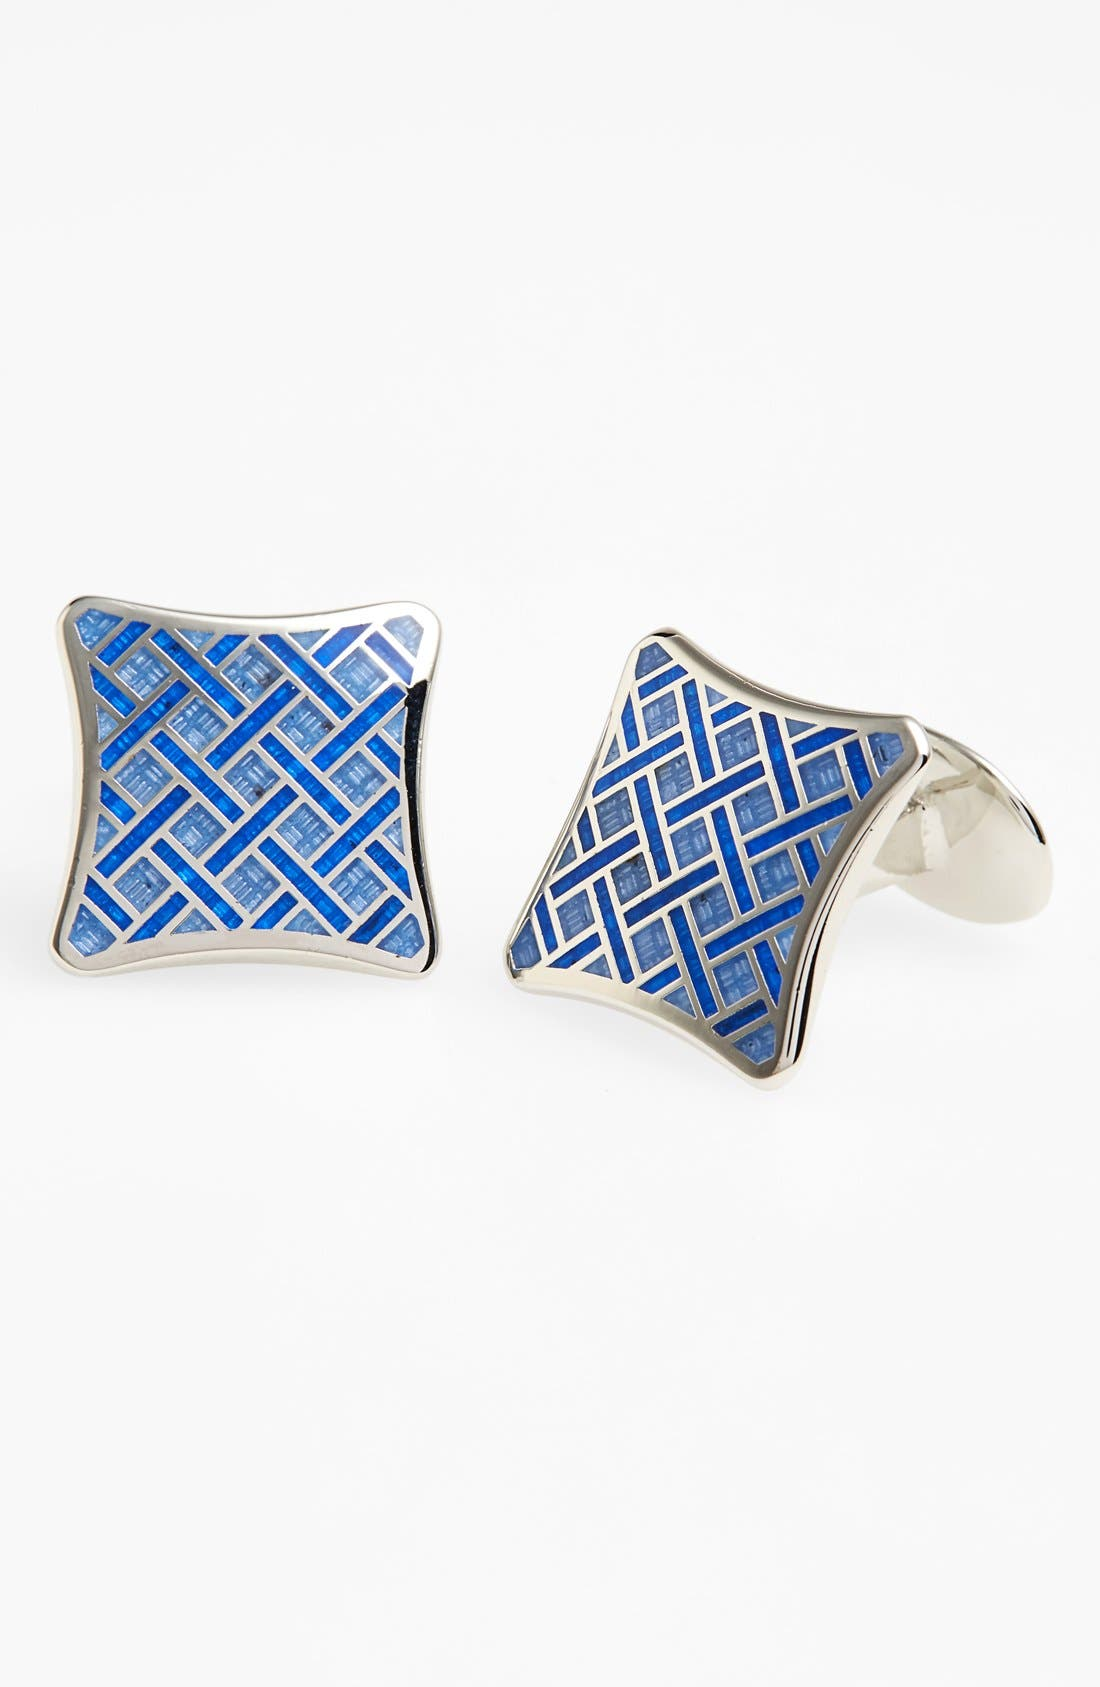 Basketweave Cuff Links,                         Main,                         color, Silver/ Light Blue/ Blue